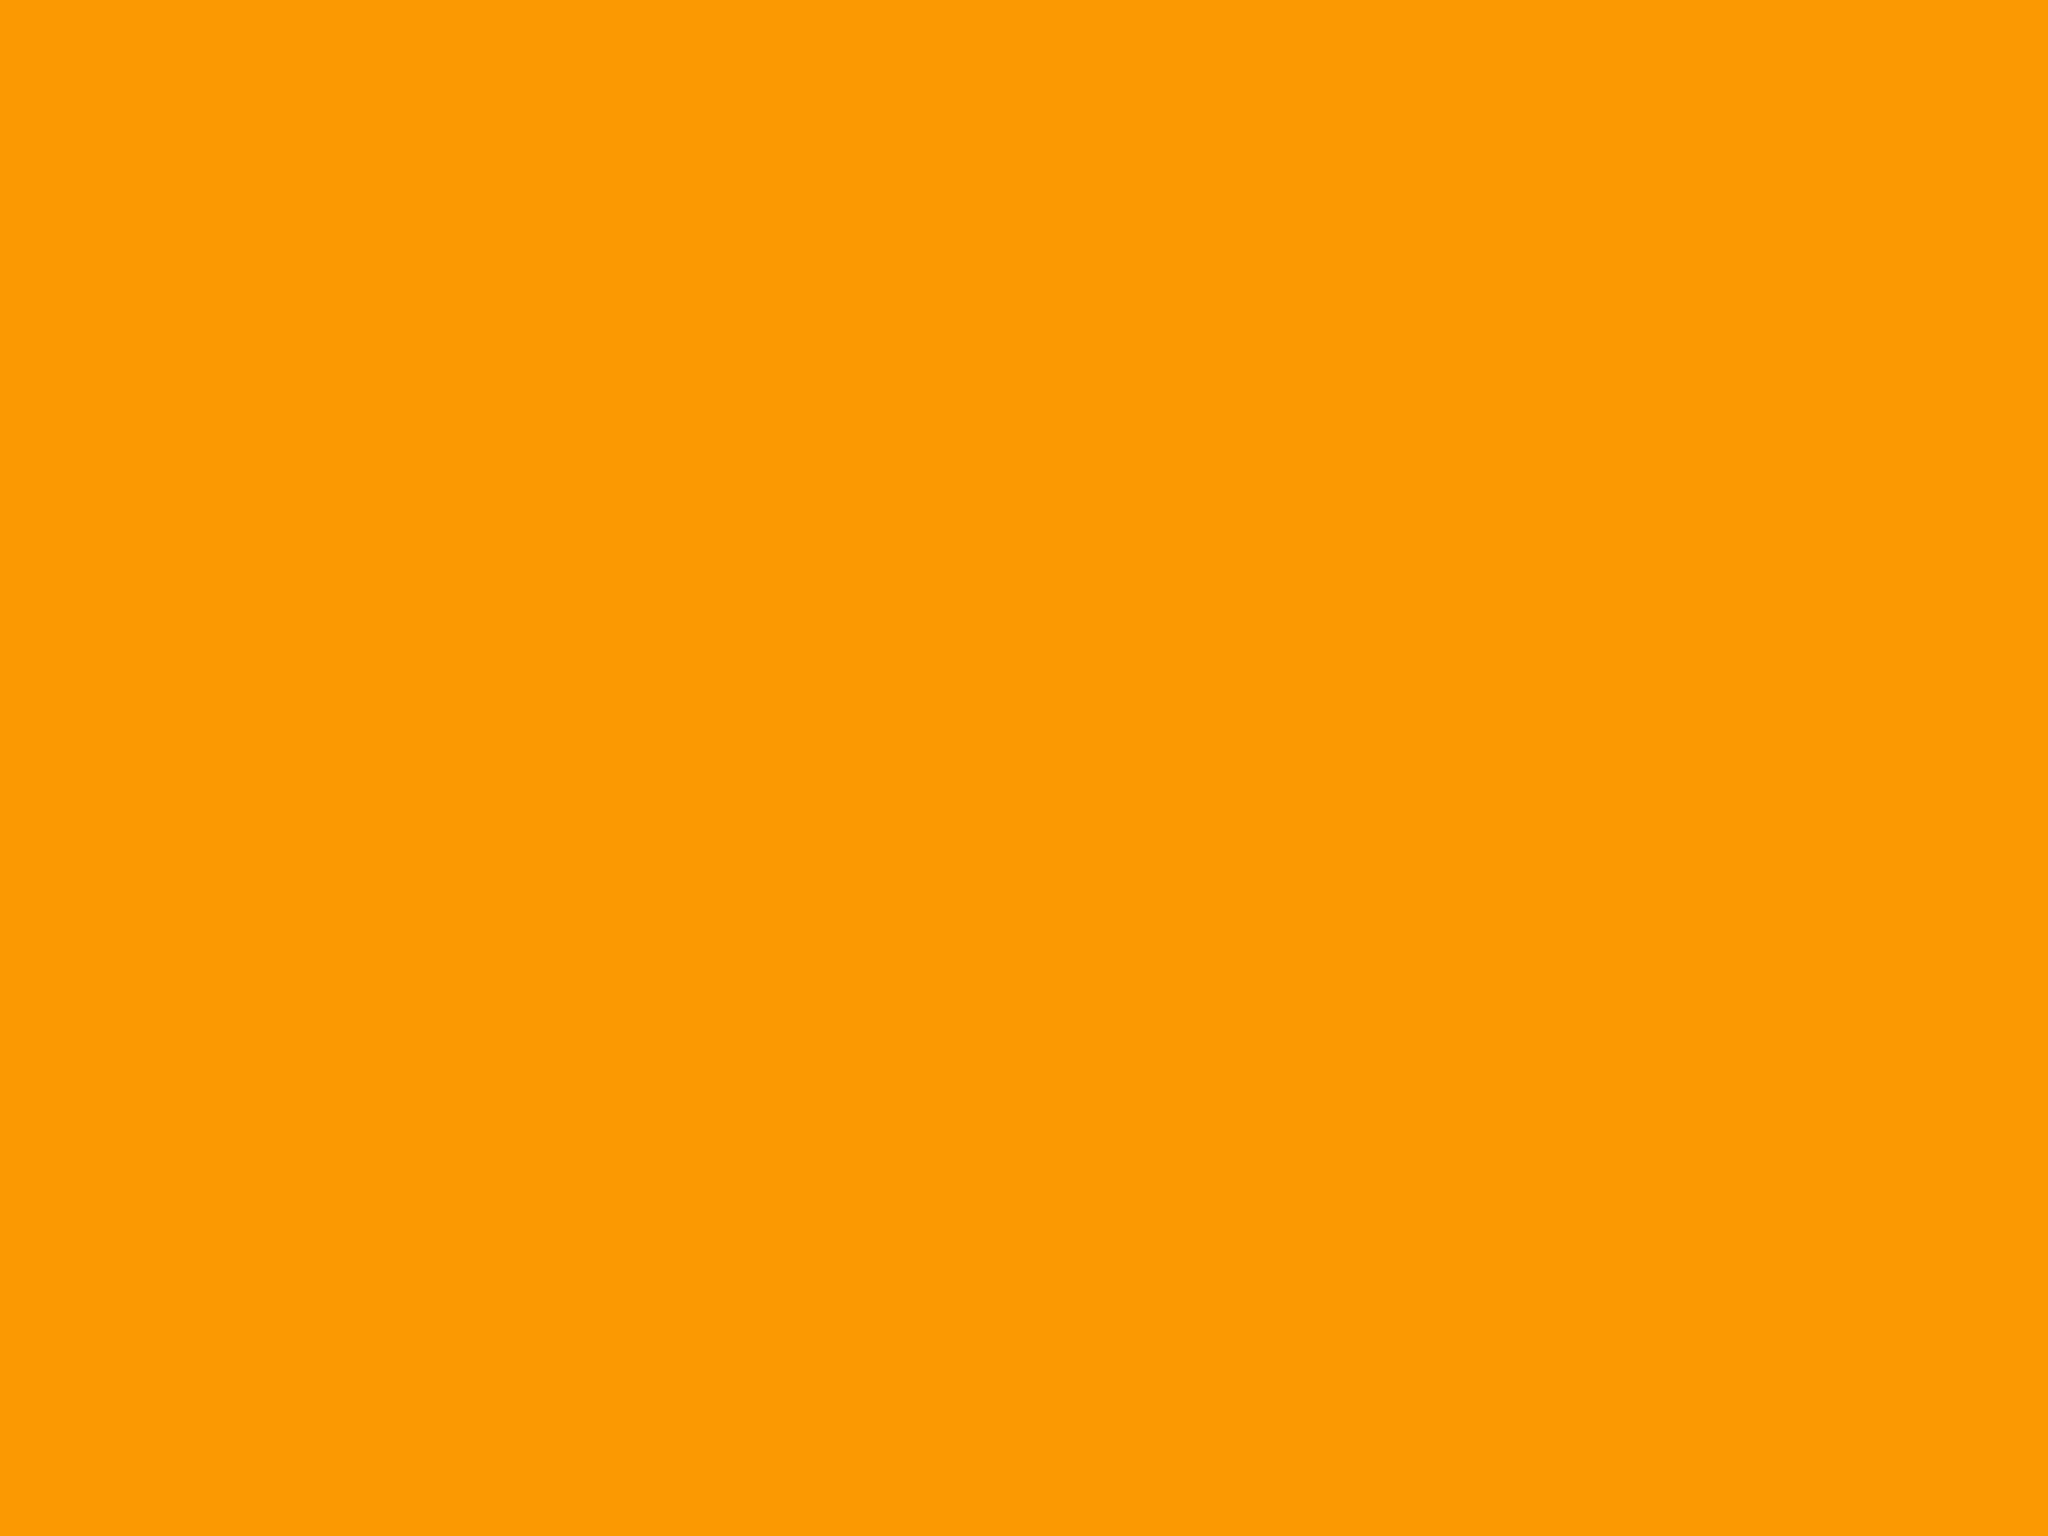 2048x1536 Orange RYB Solid Color Background